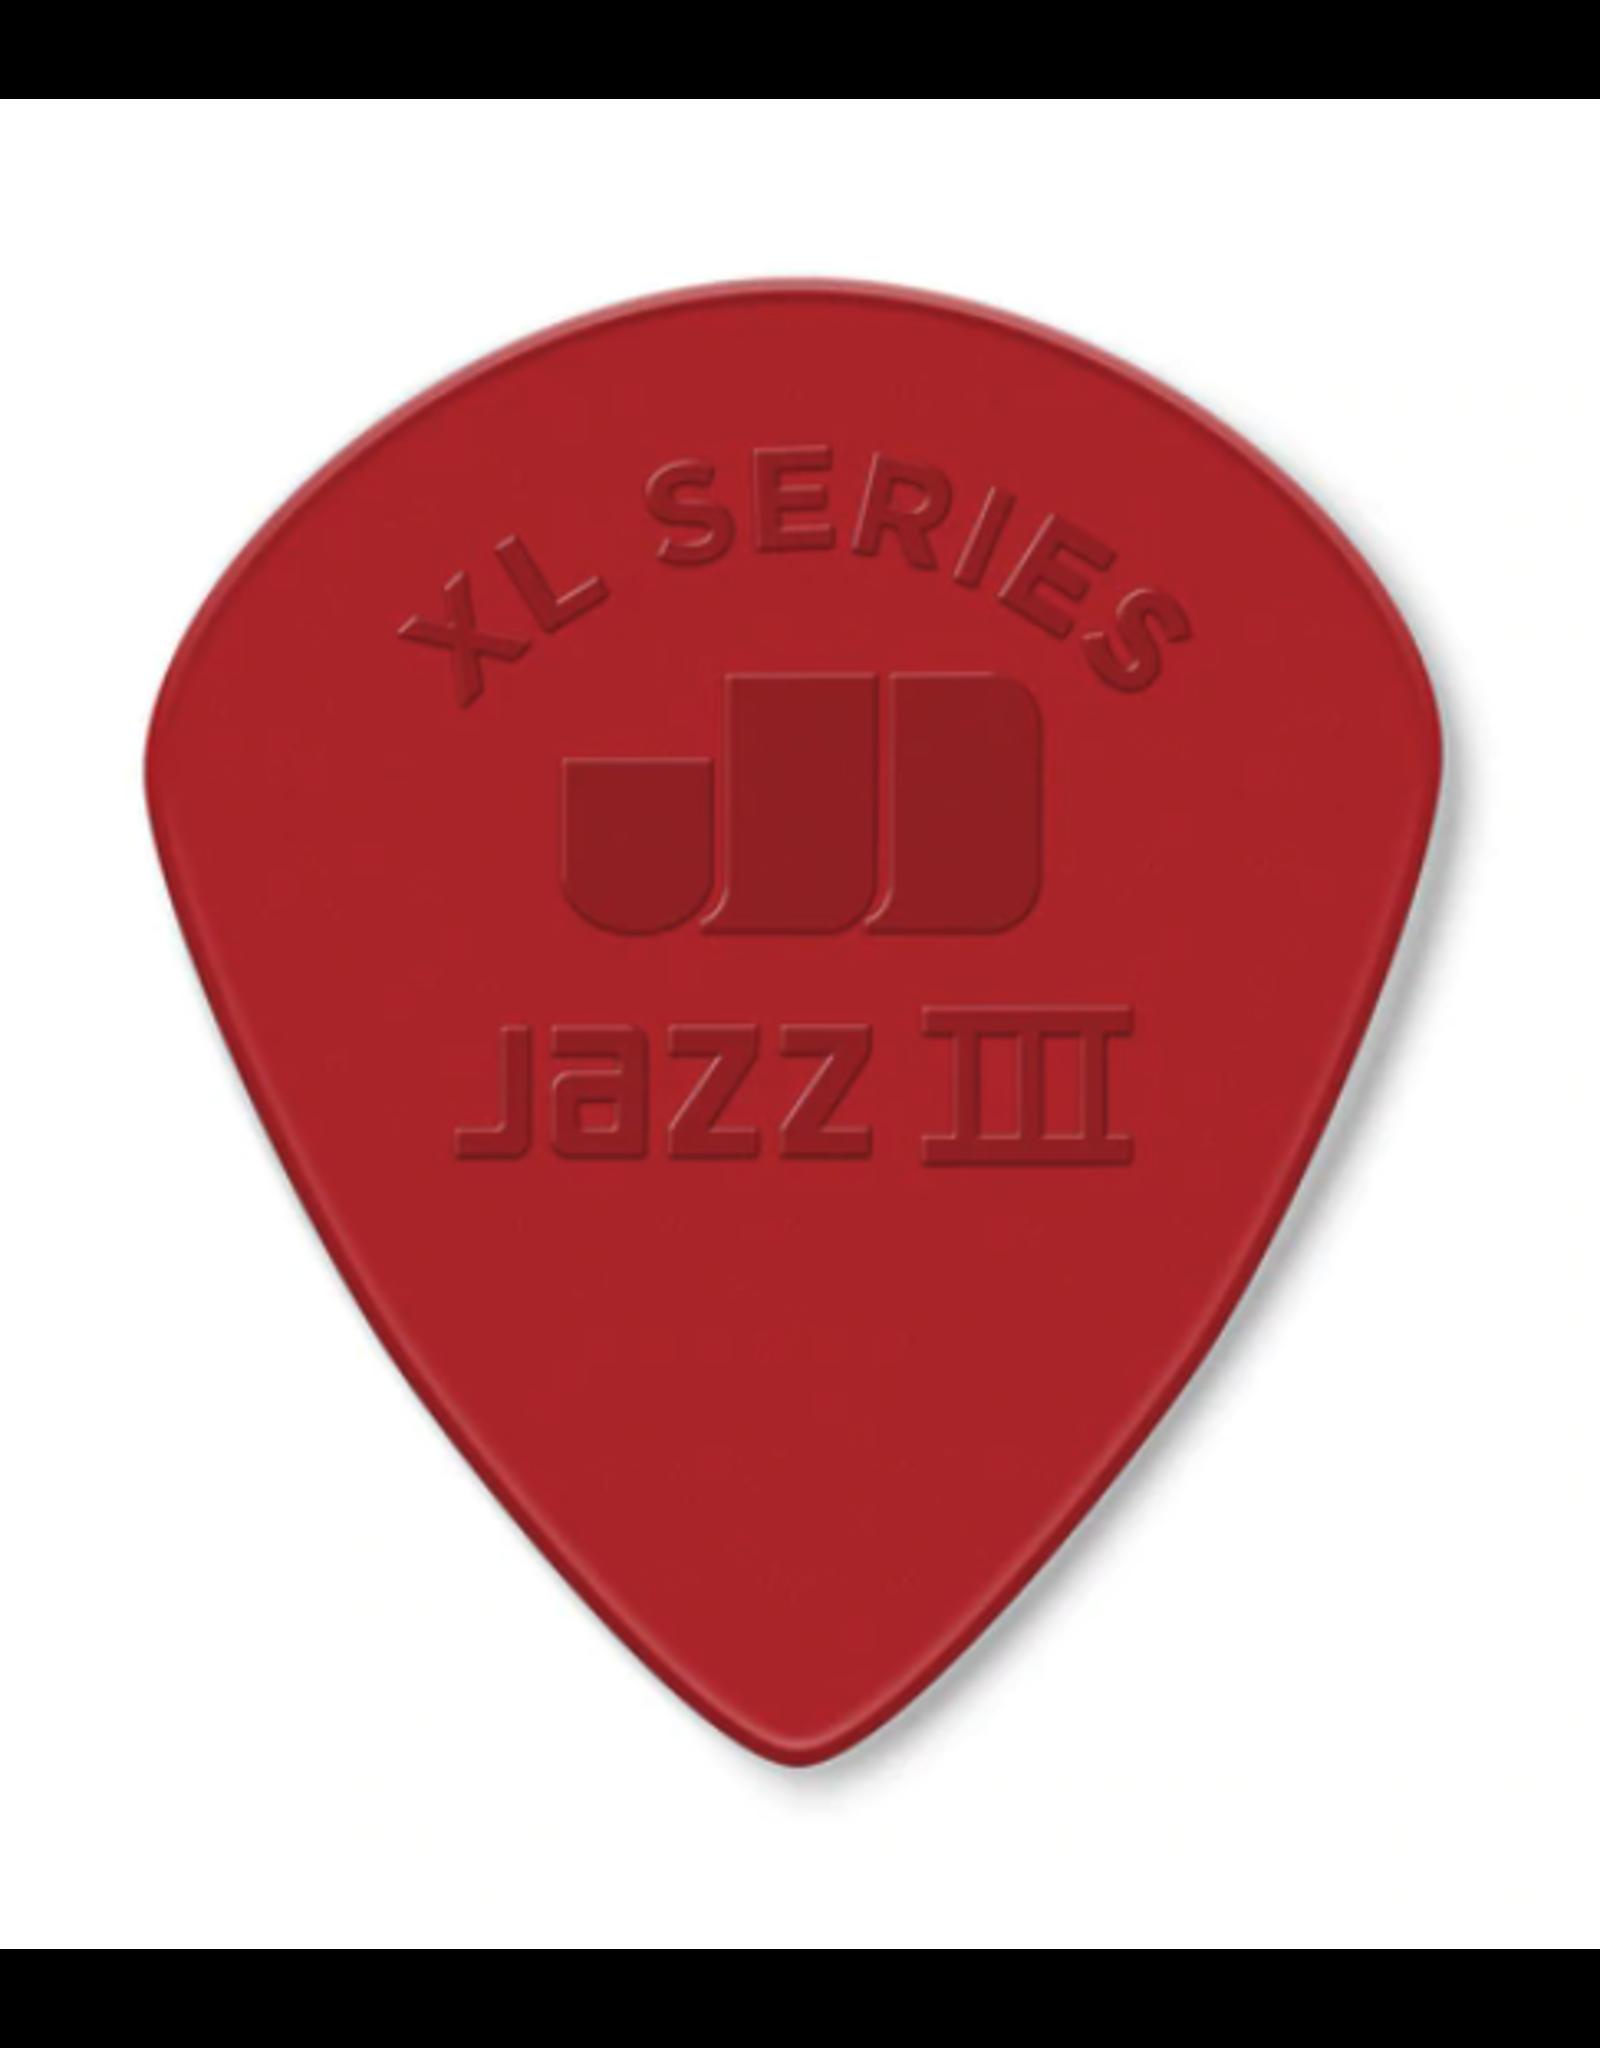 Dunlop Dunlop Nylon Jazz III XL Guitar Pick - Red Nylon